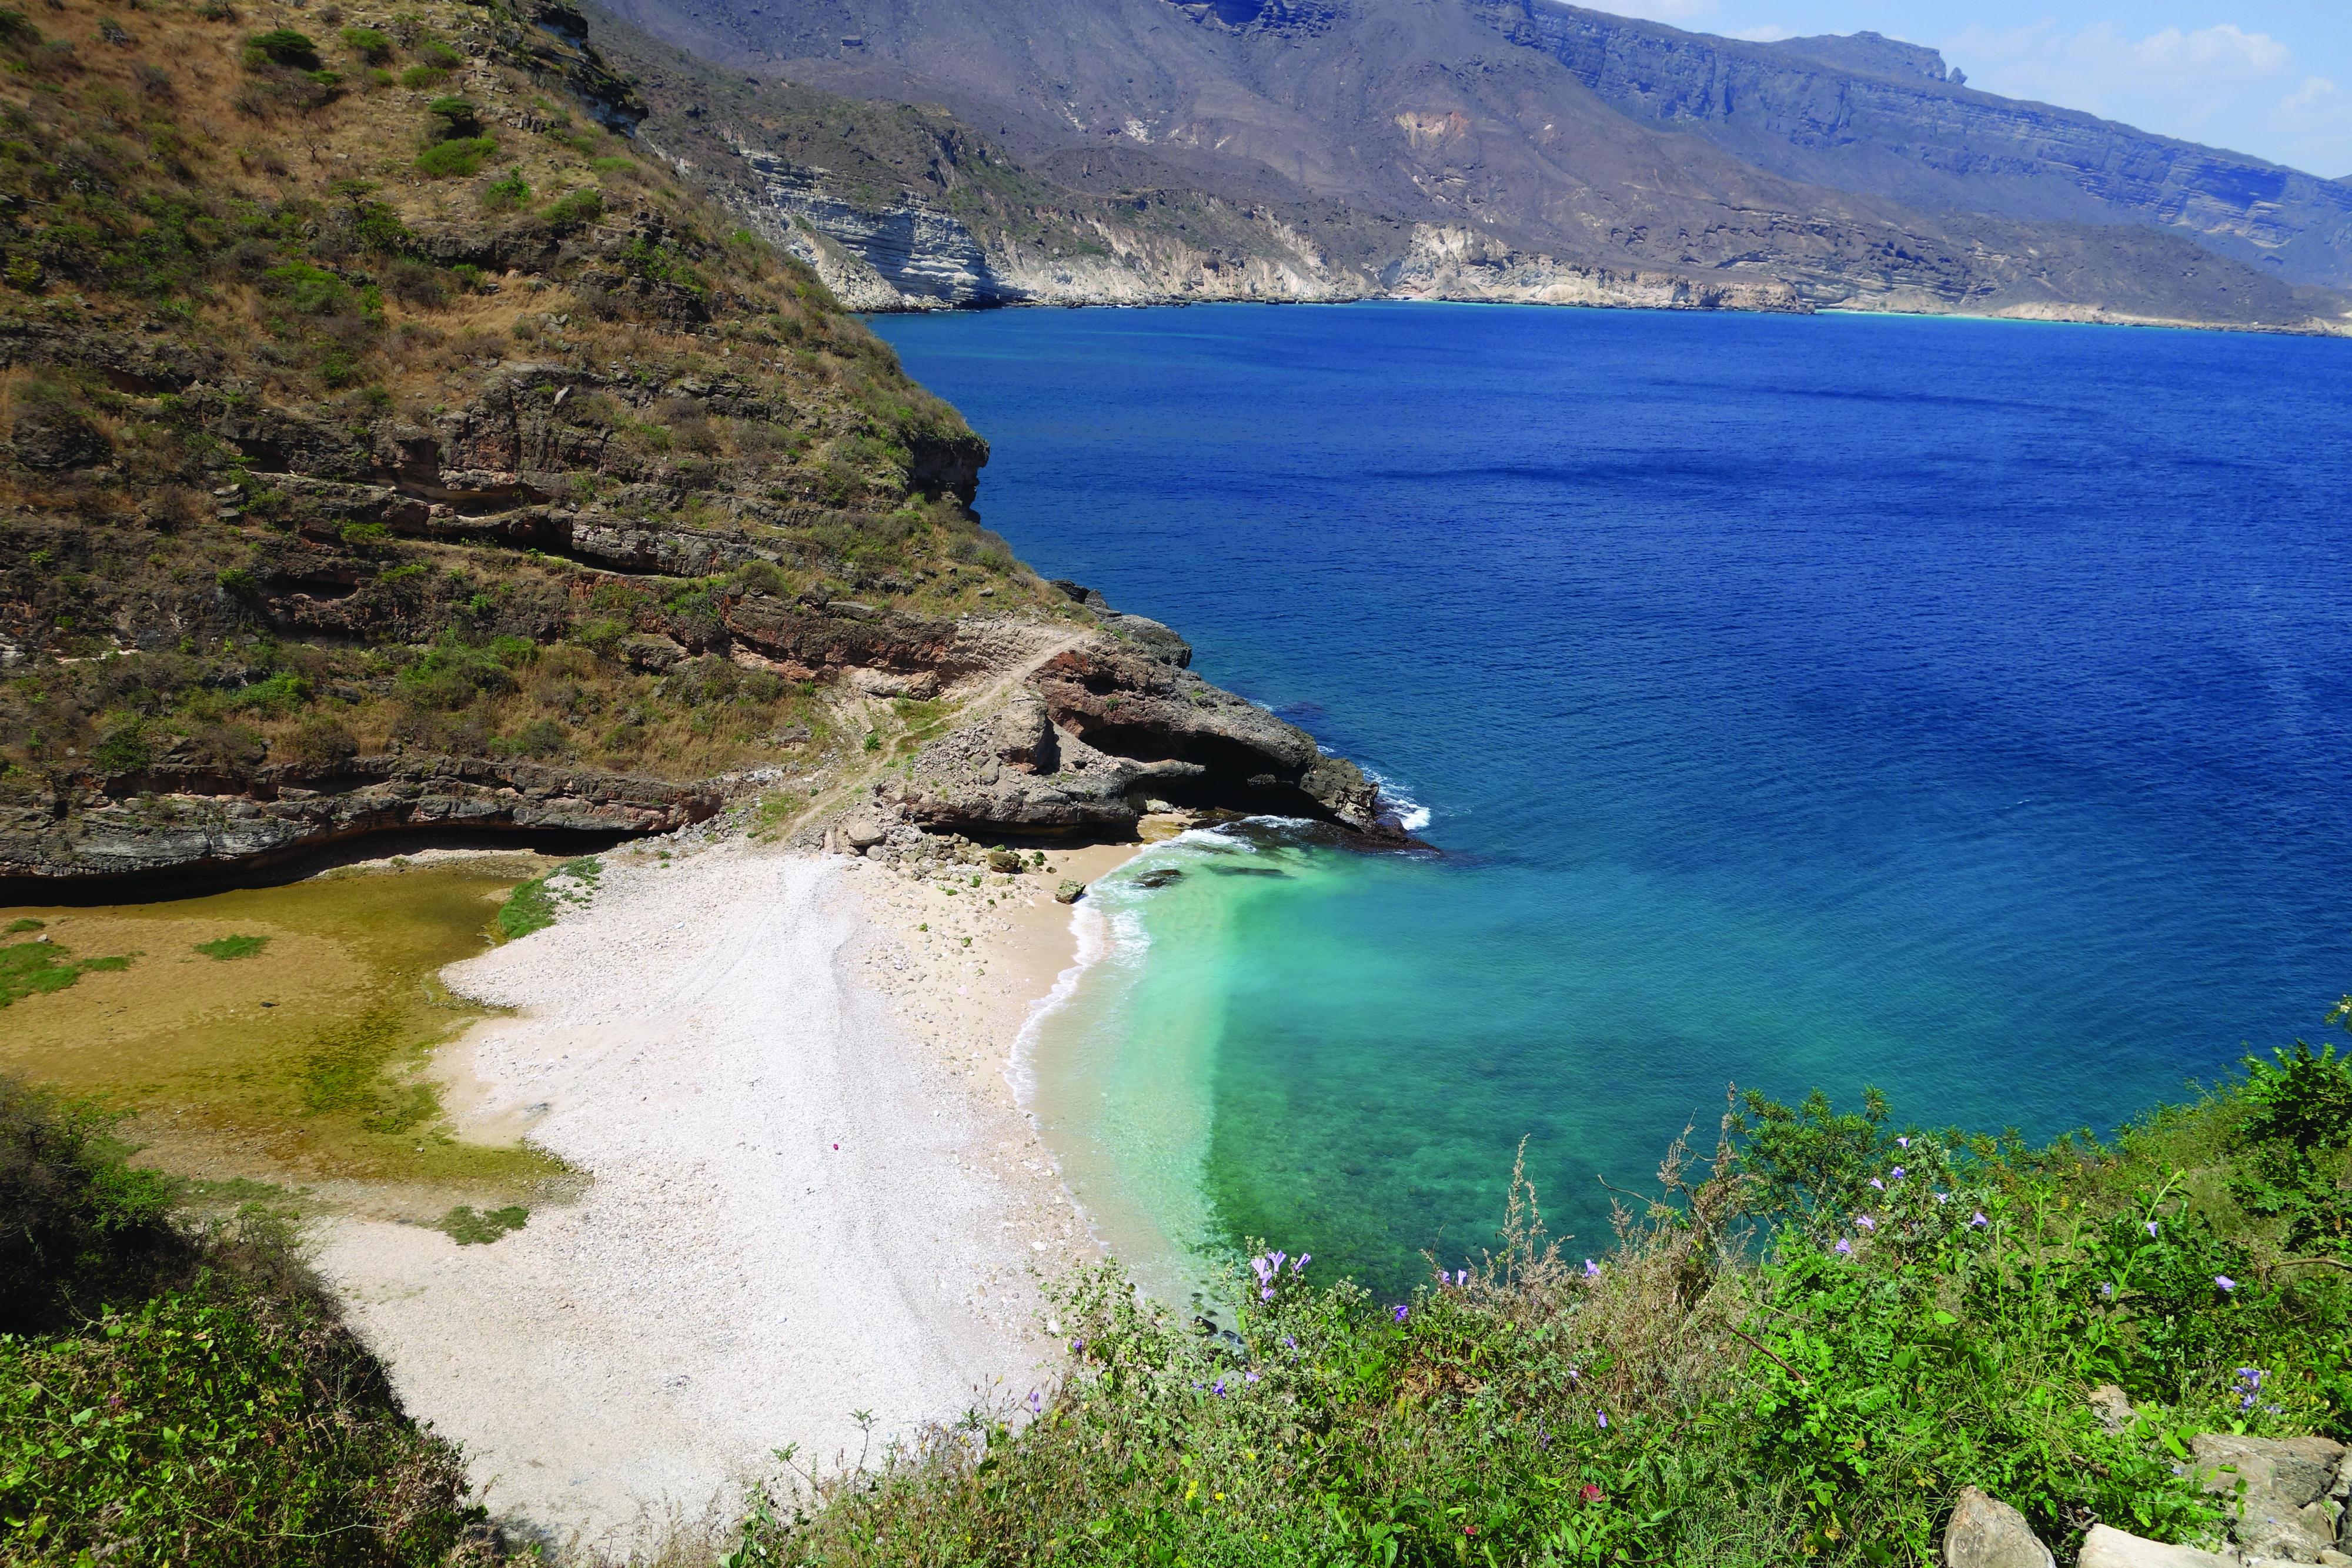 Oman tourism: Breathtaking Beach at Shat in Dhofar